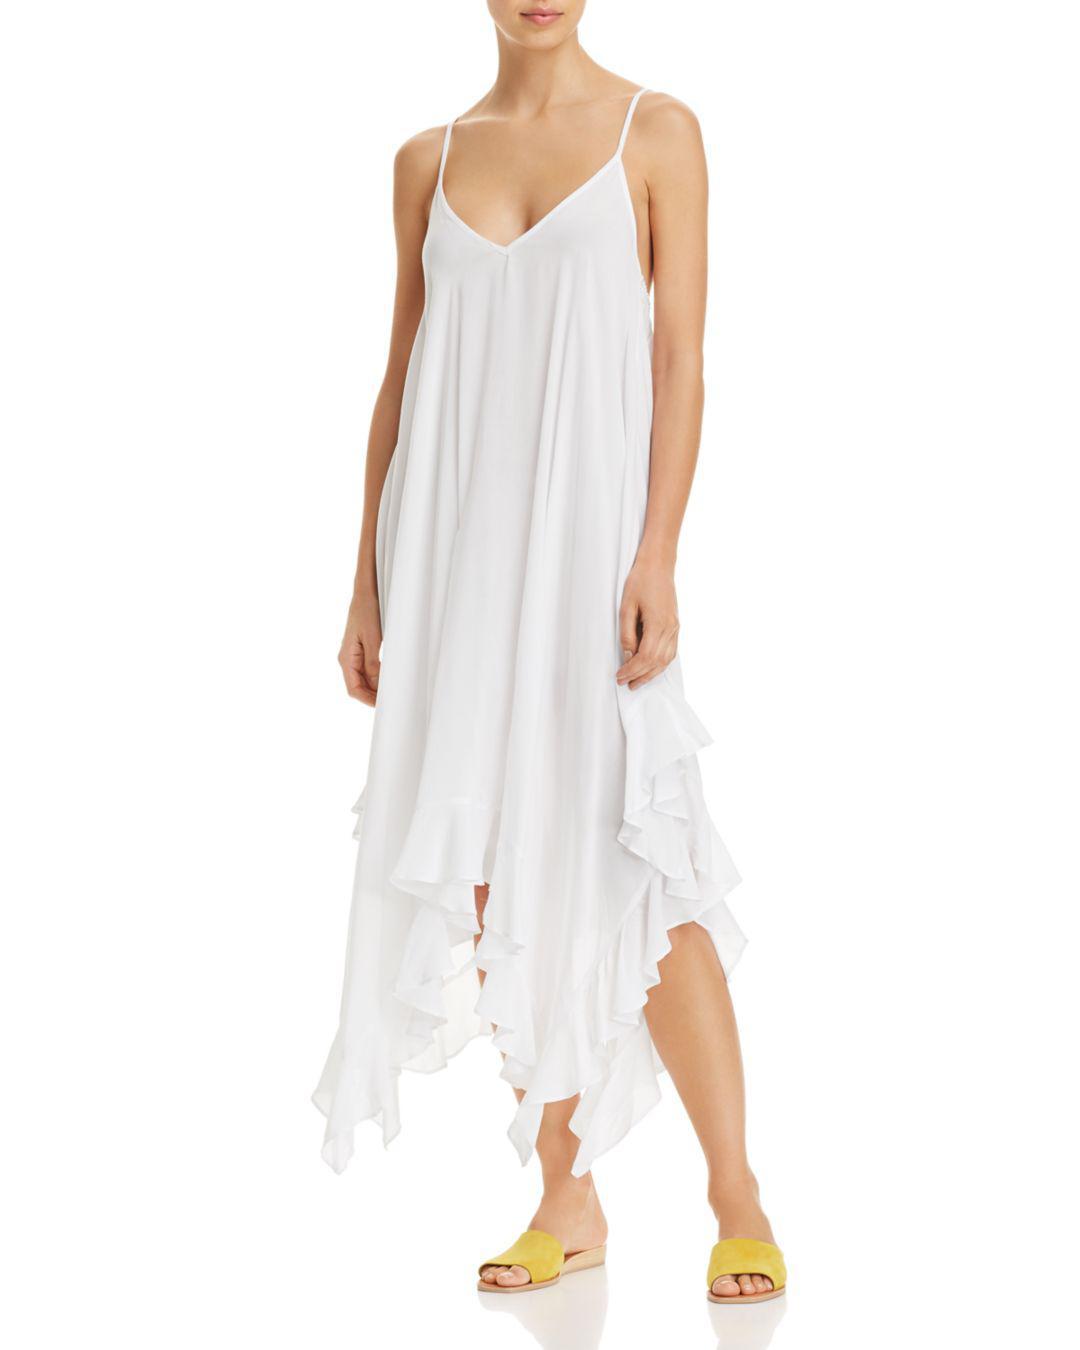 0e665390ad6c3 Lyst - Bleu Rod Beattie Handkerchief-hem Dress Swim Cover-up in White